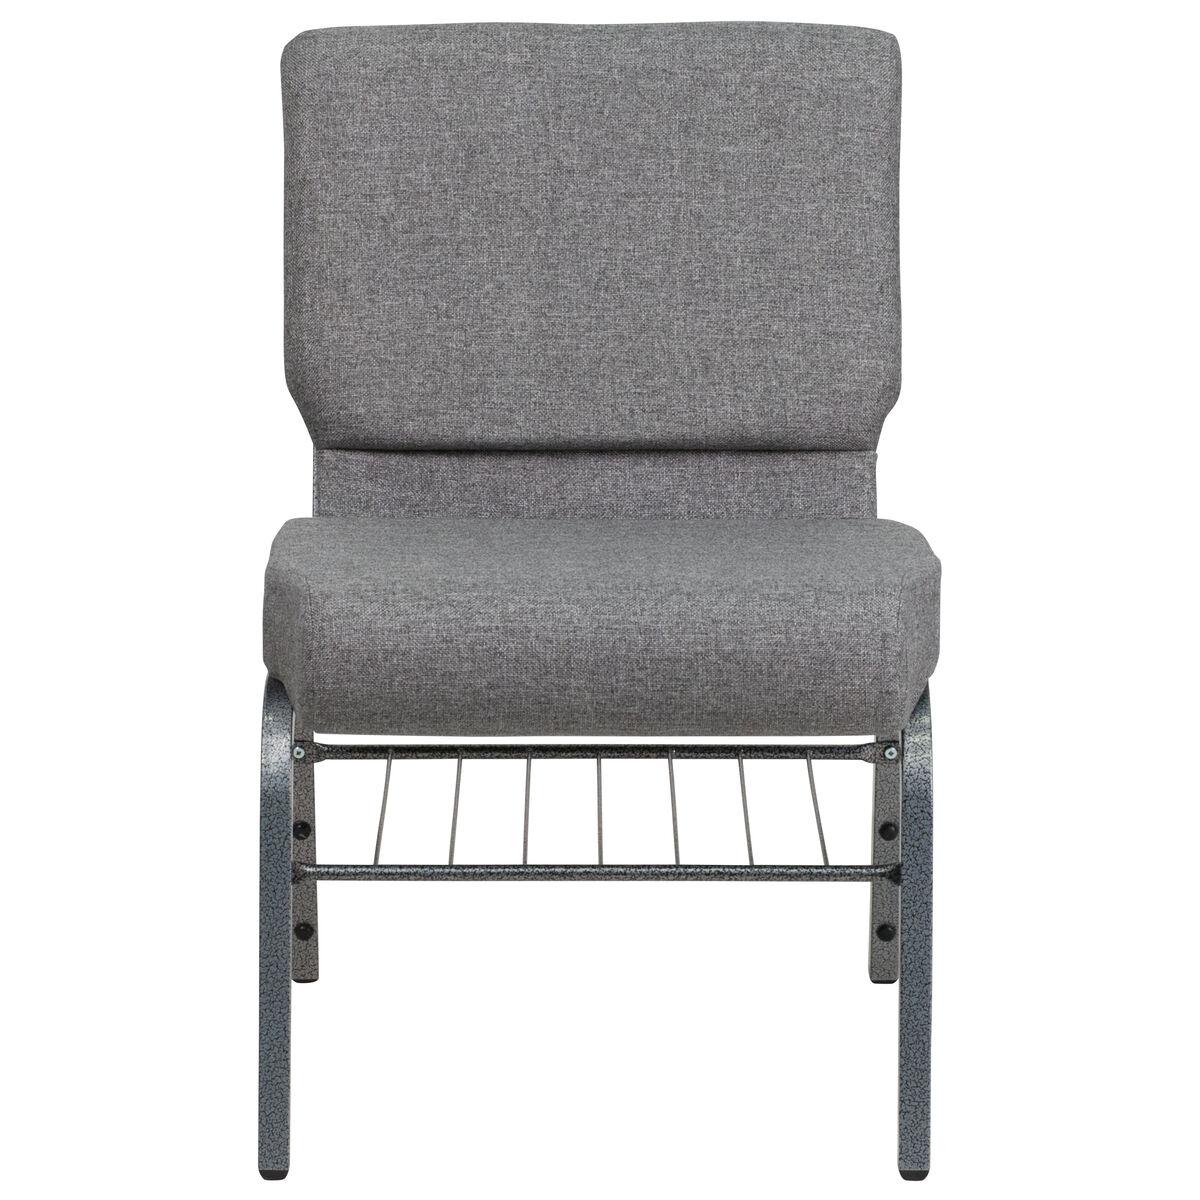 gray fabric church chair xu ch0221 gy sv bas gg bizchair com